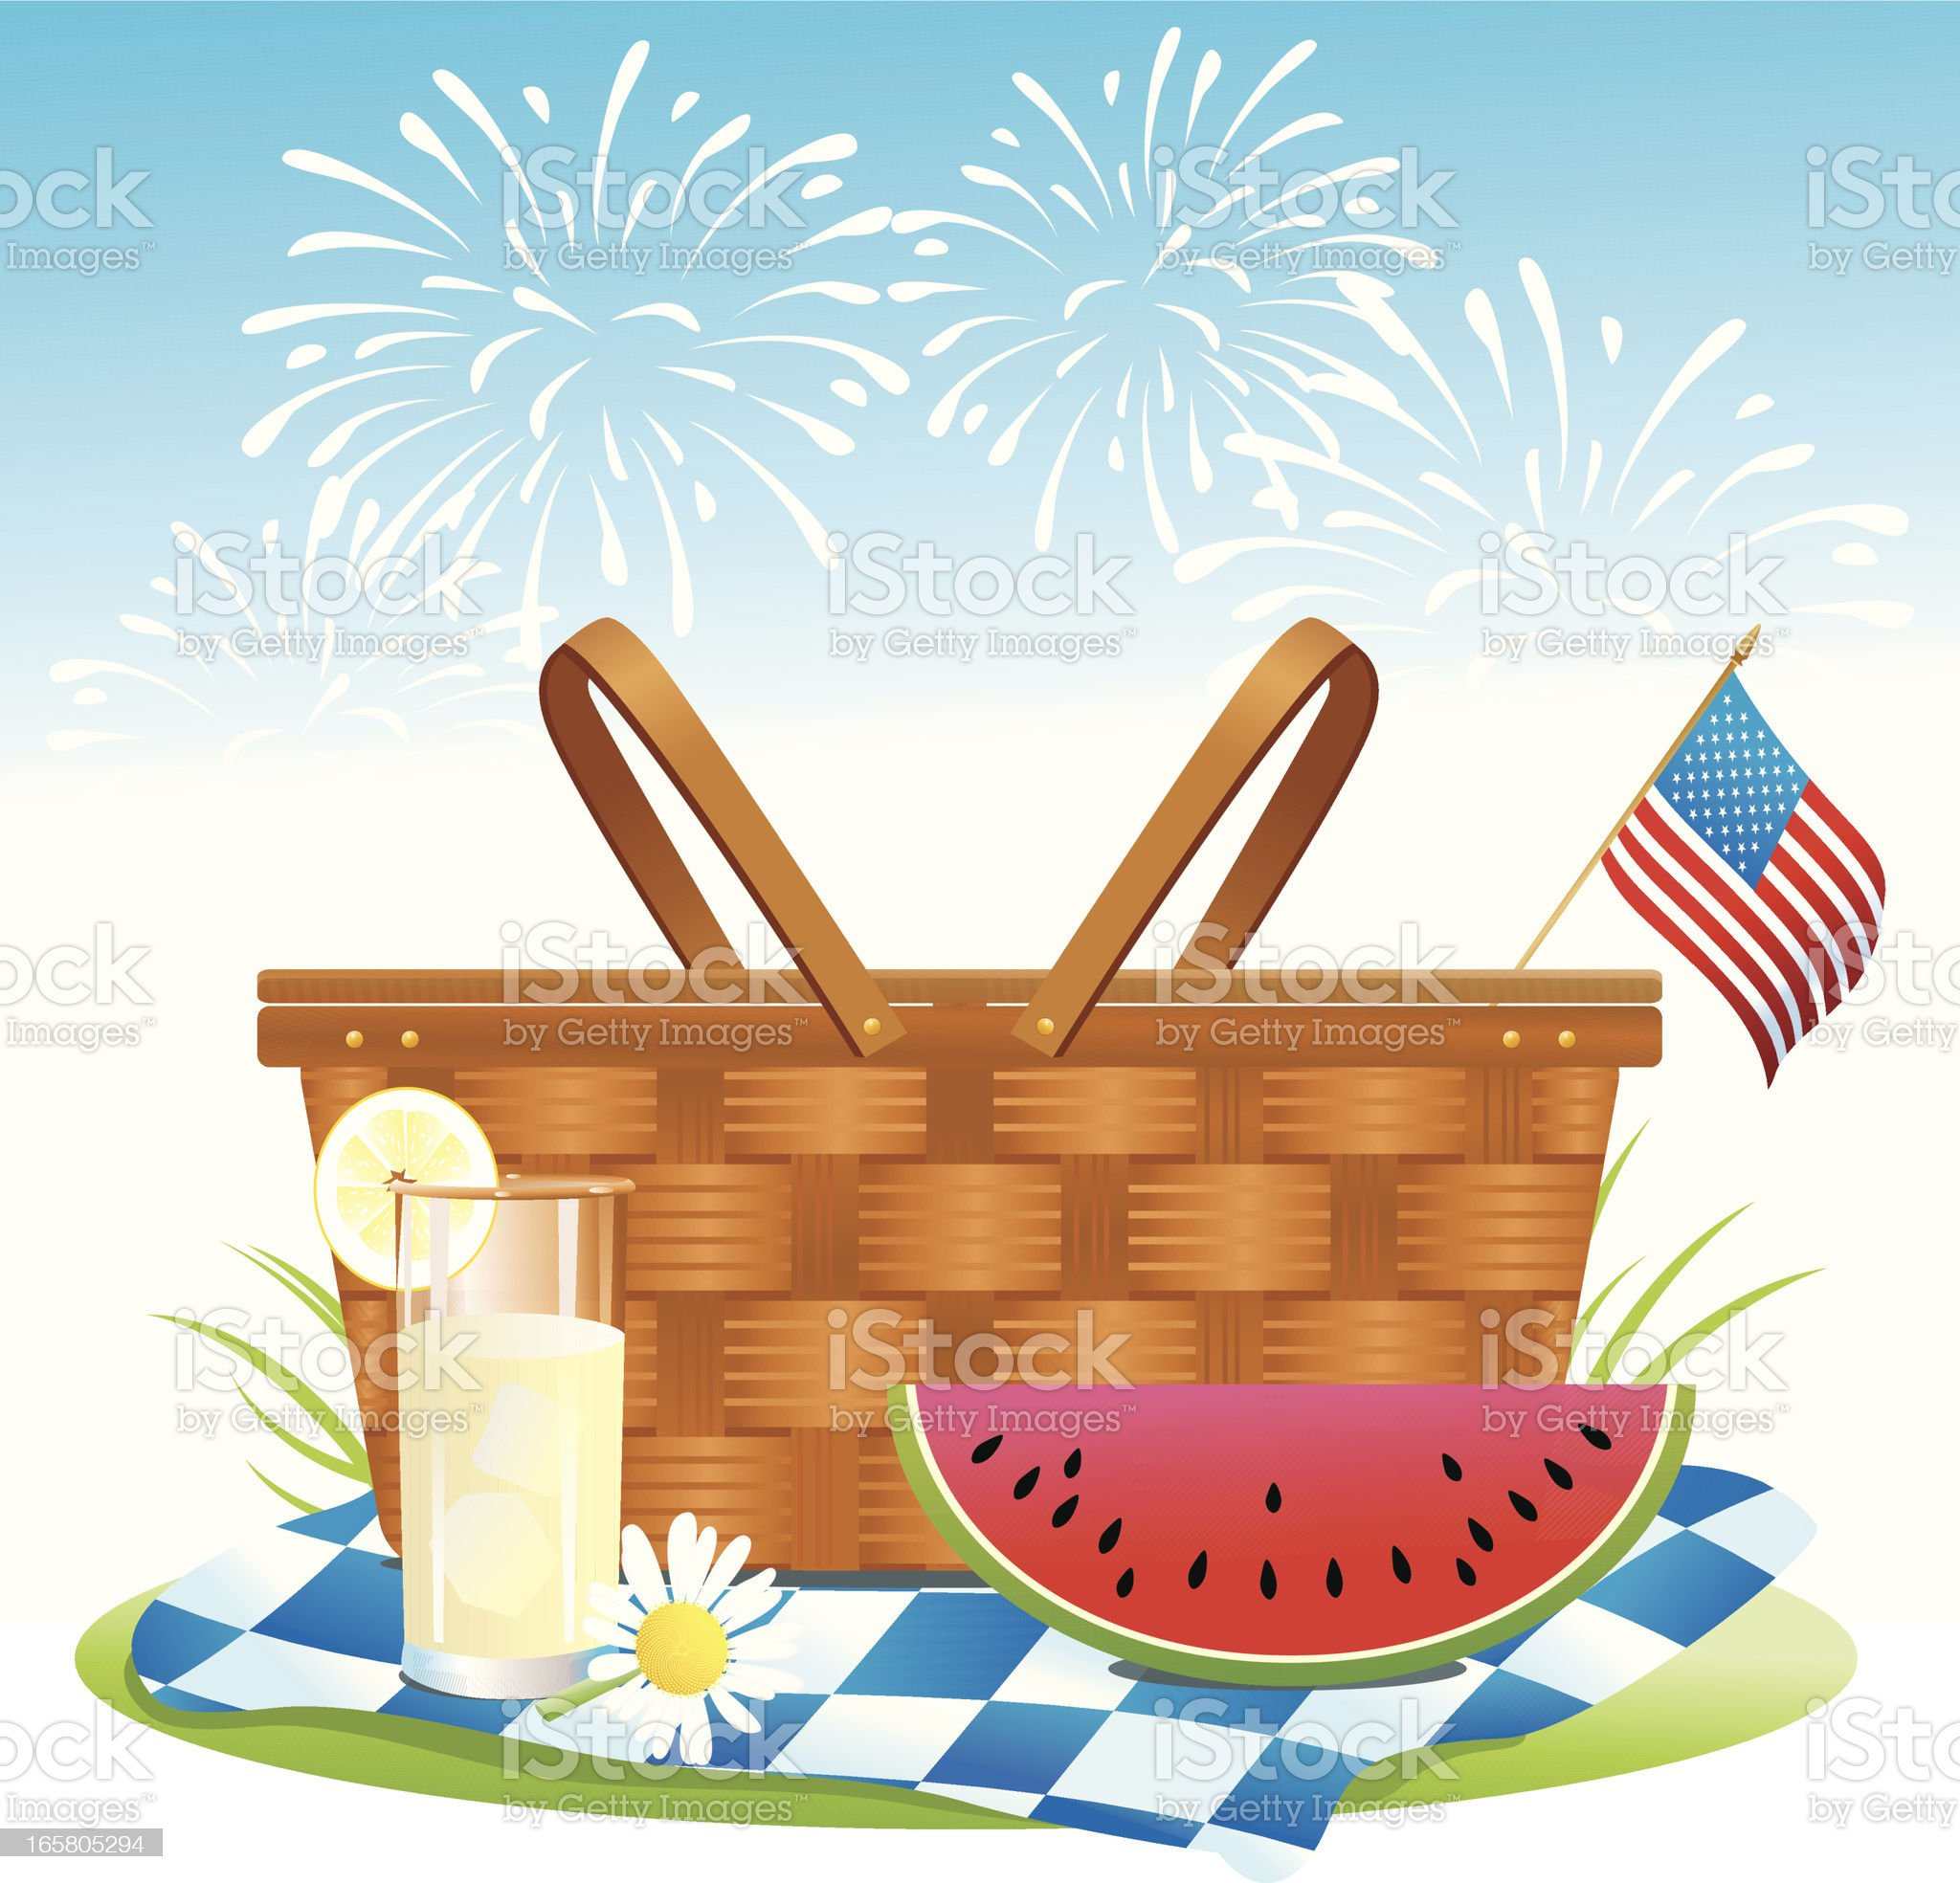 Patriotic Picnic royalty-free stock vector art